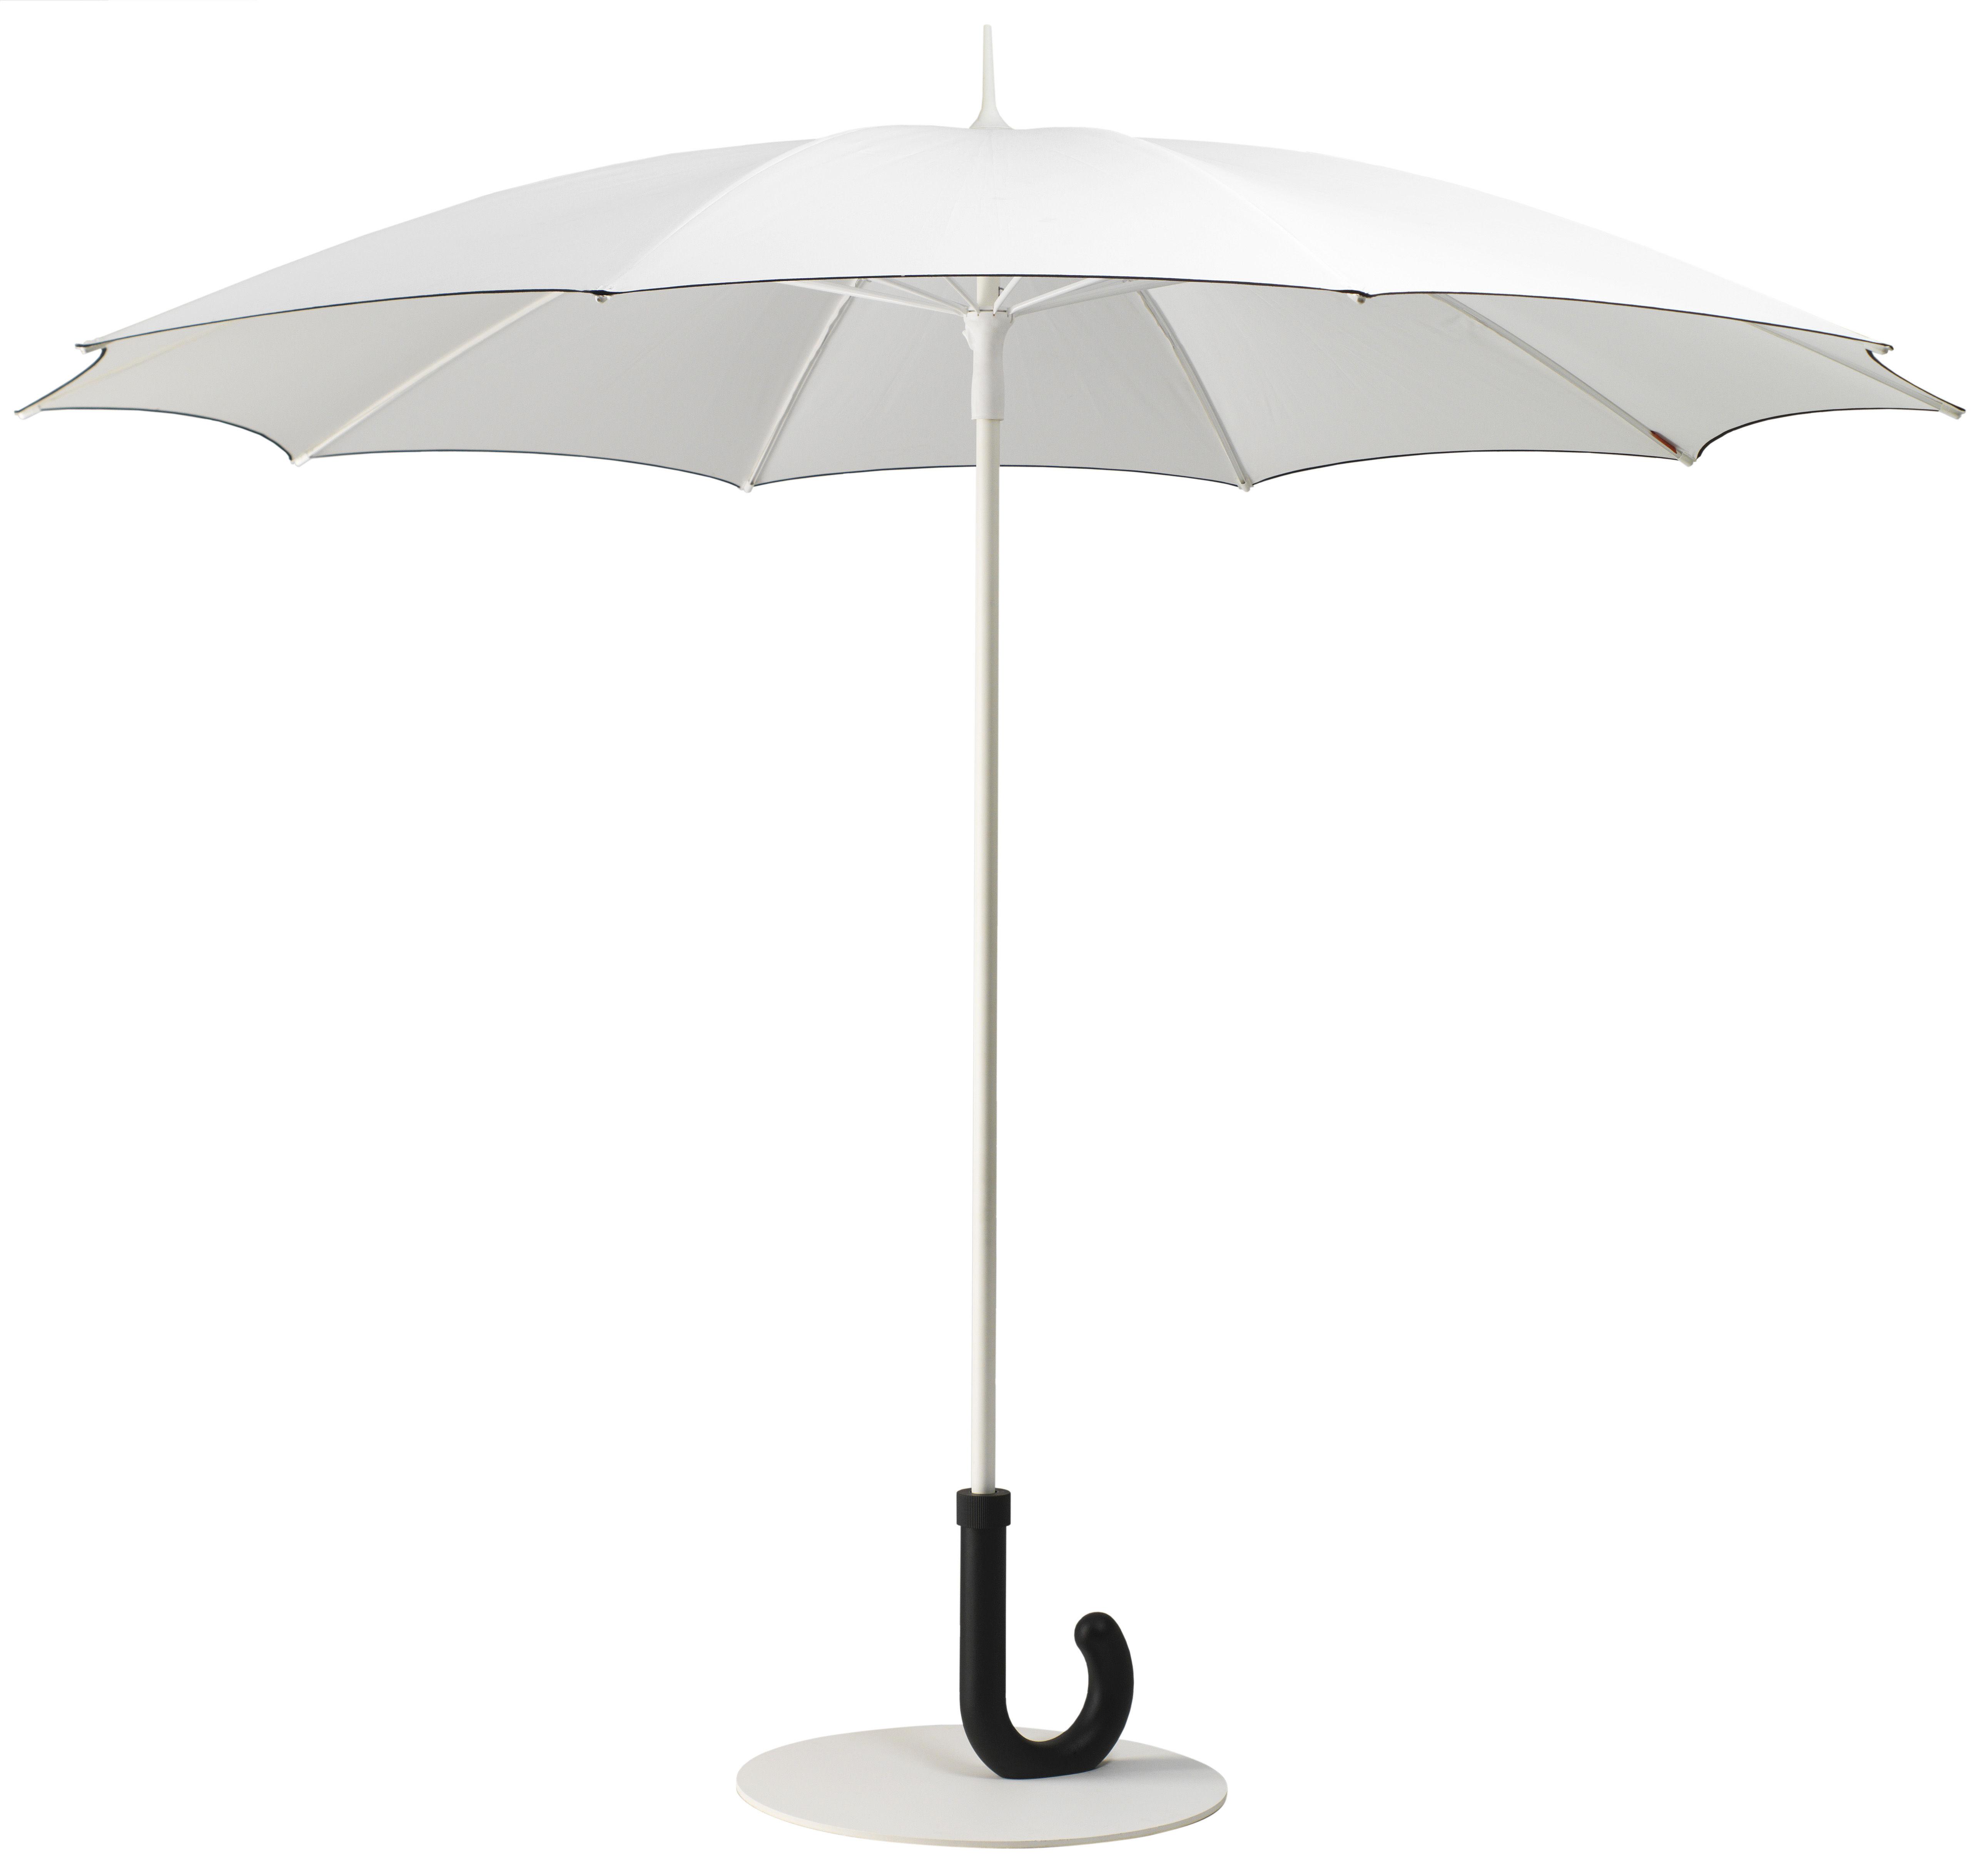 gulliver parasol 295 cm blanc by sywawa. Black Bedroom Furniture Sets. Home Design Ideas